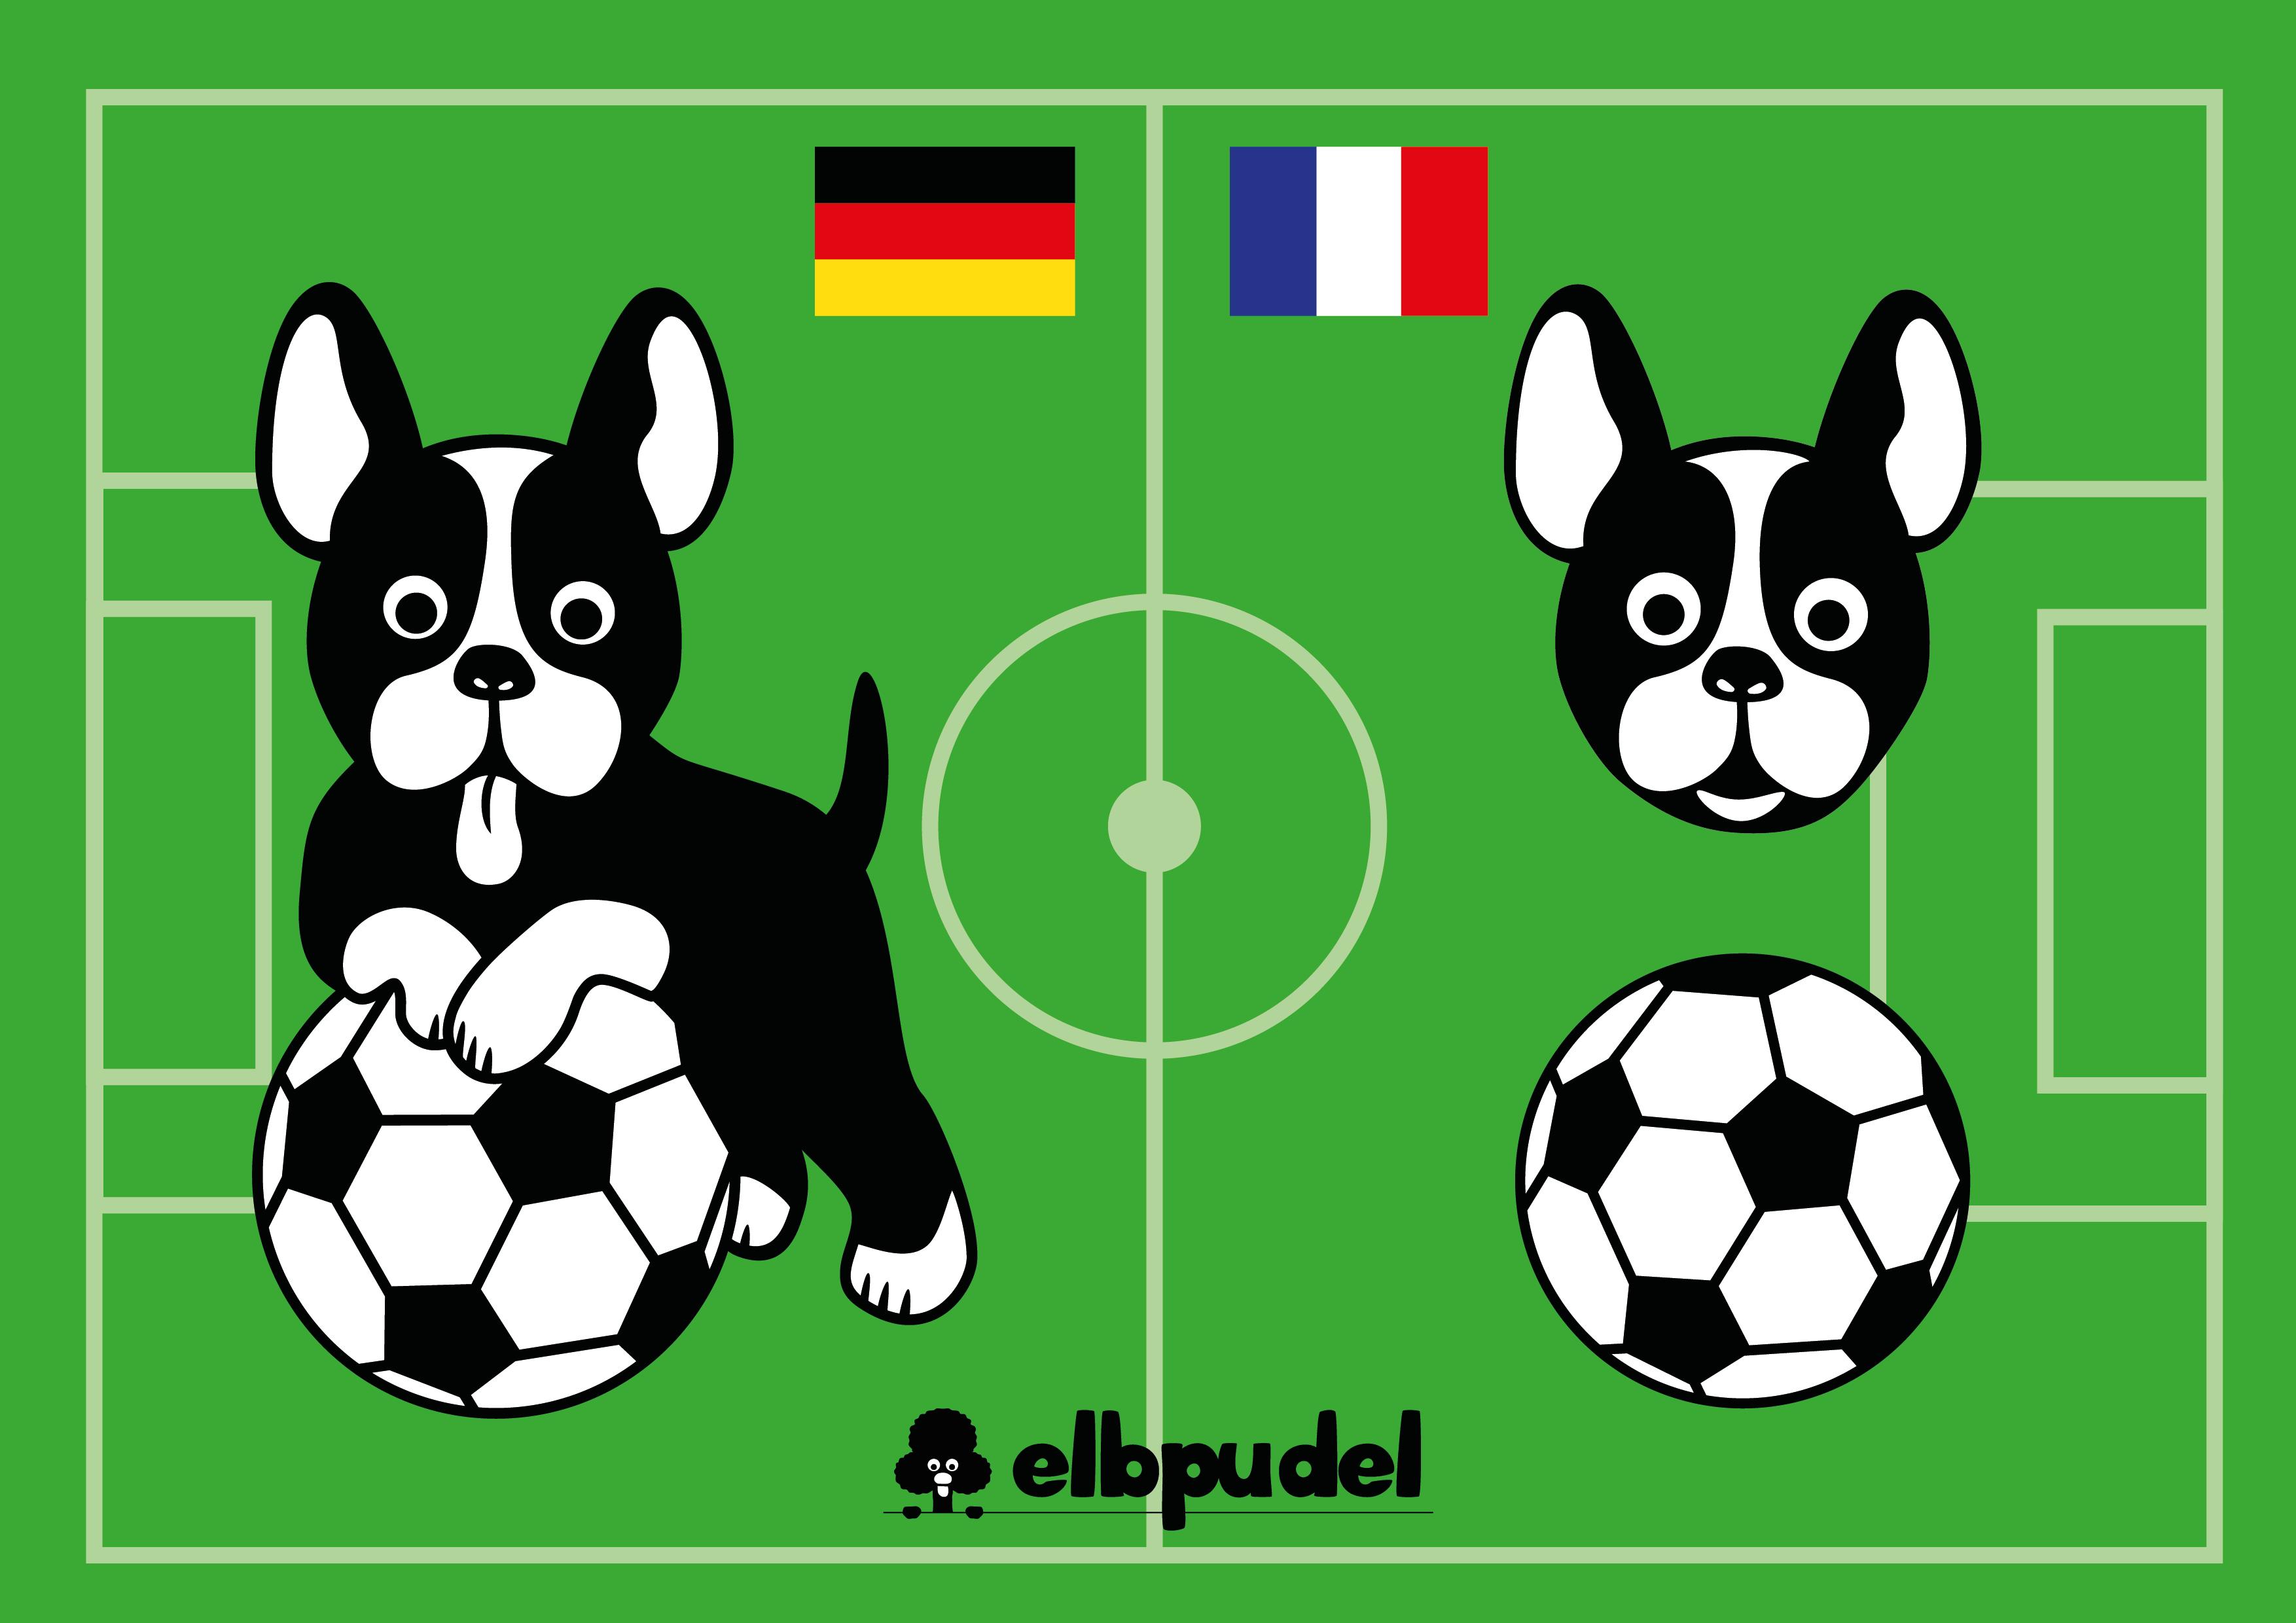 elbpudlFussballdoggeBanner